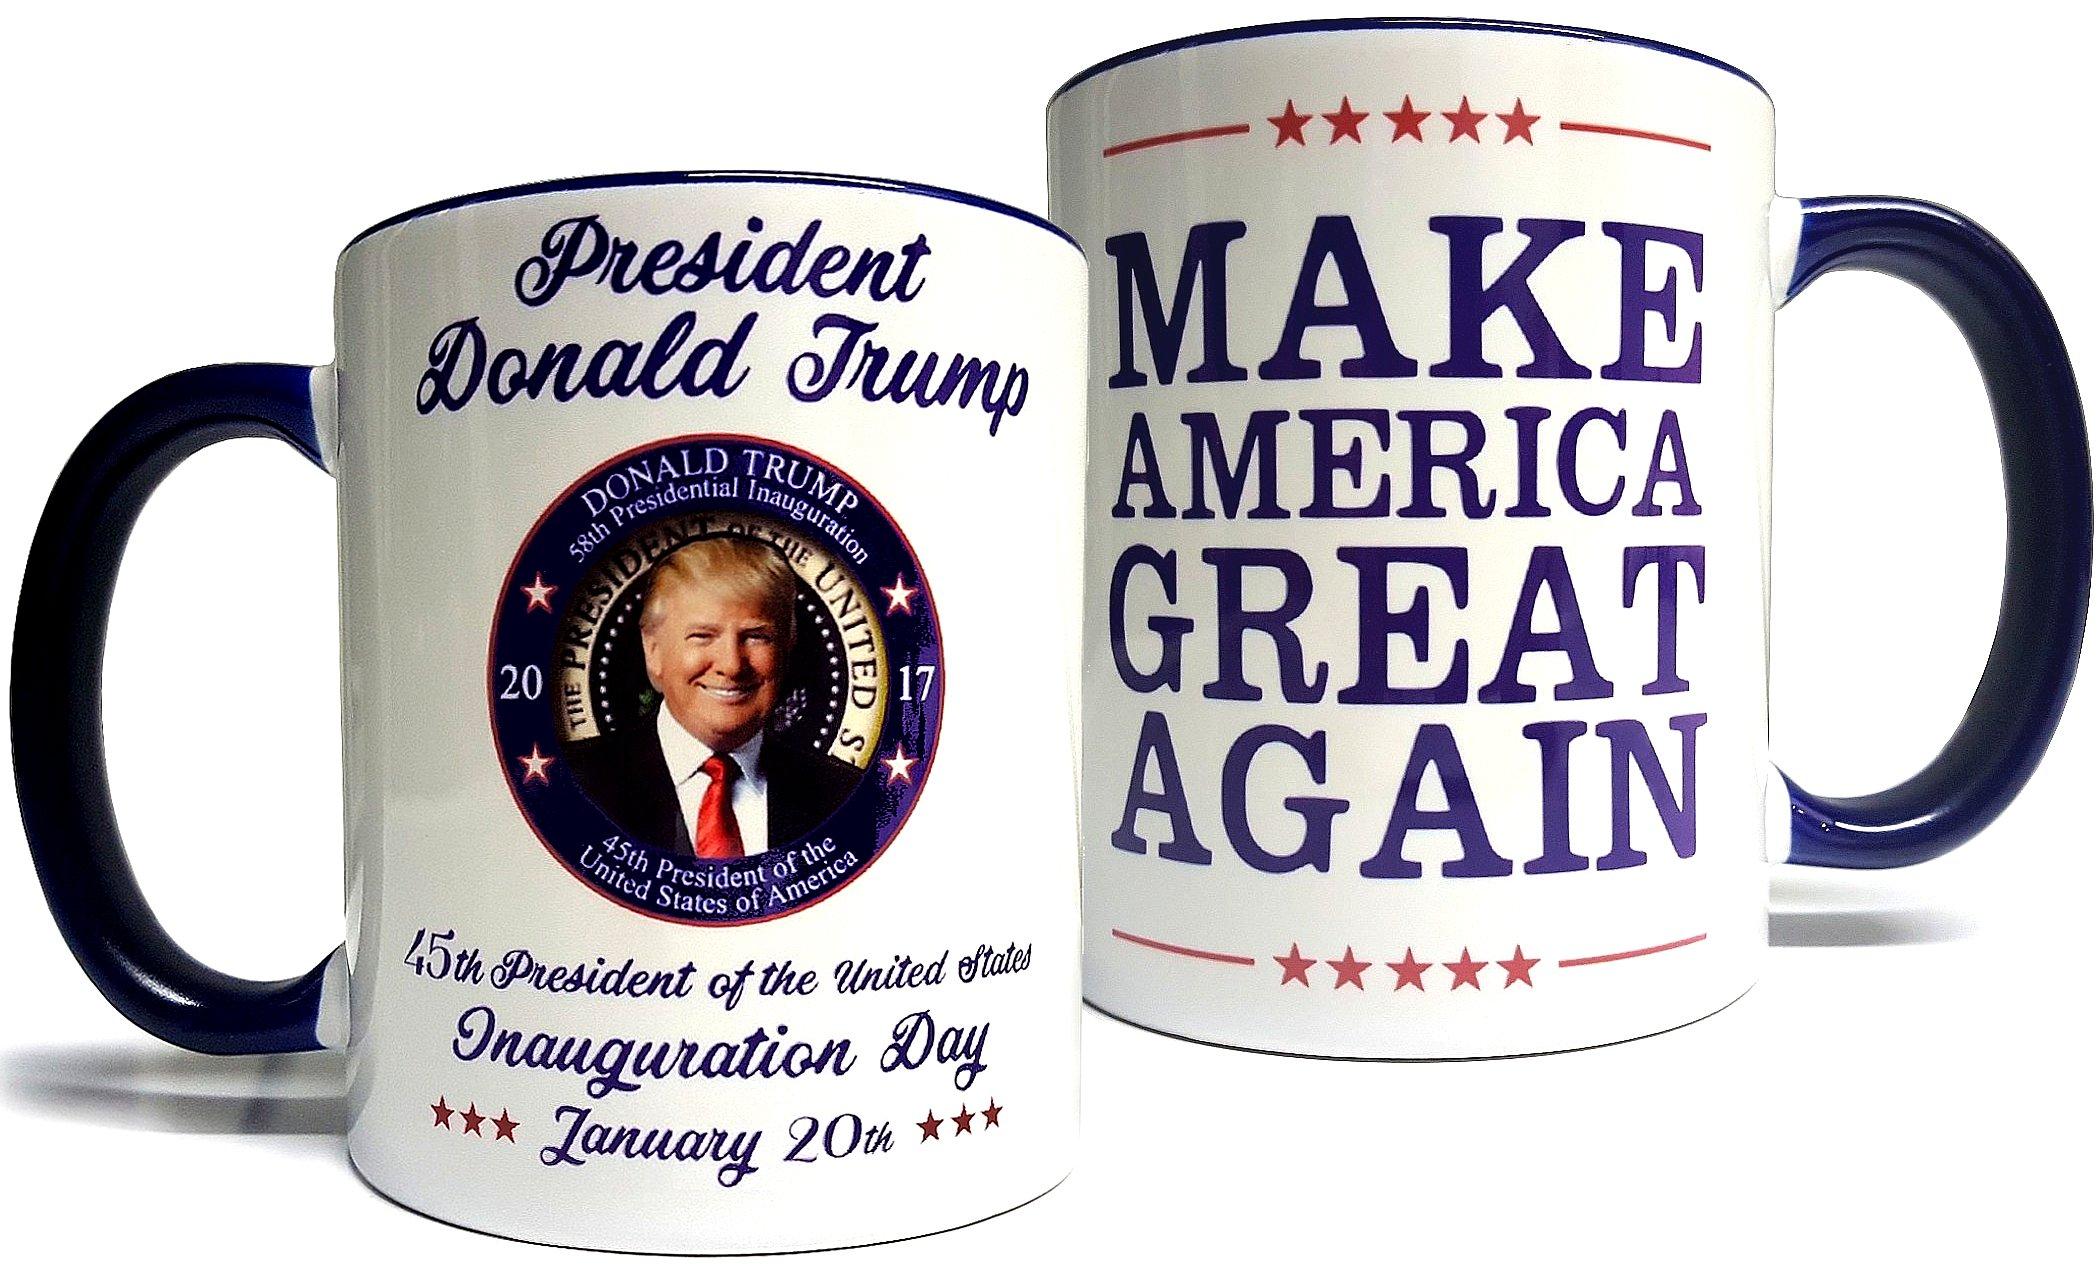 Donald Trump Inauguration Mug - Make America Great Again - Quality Grade A Ceramic 11oz Mug/Cup - Foam Box Protection (Perfect Gift)